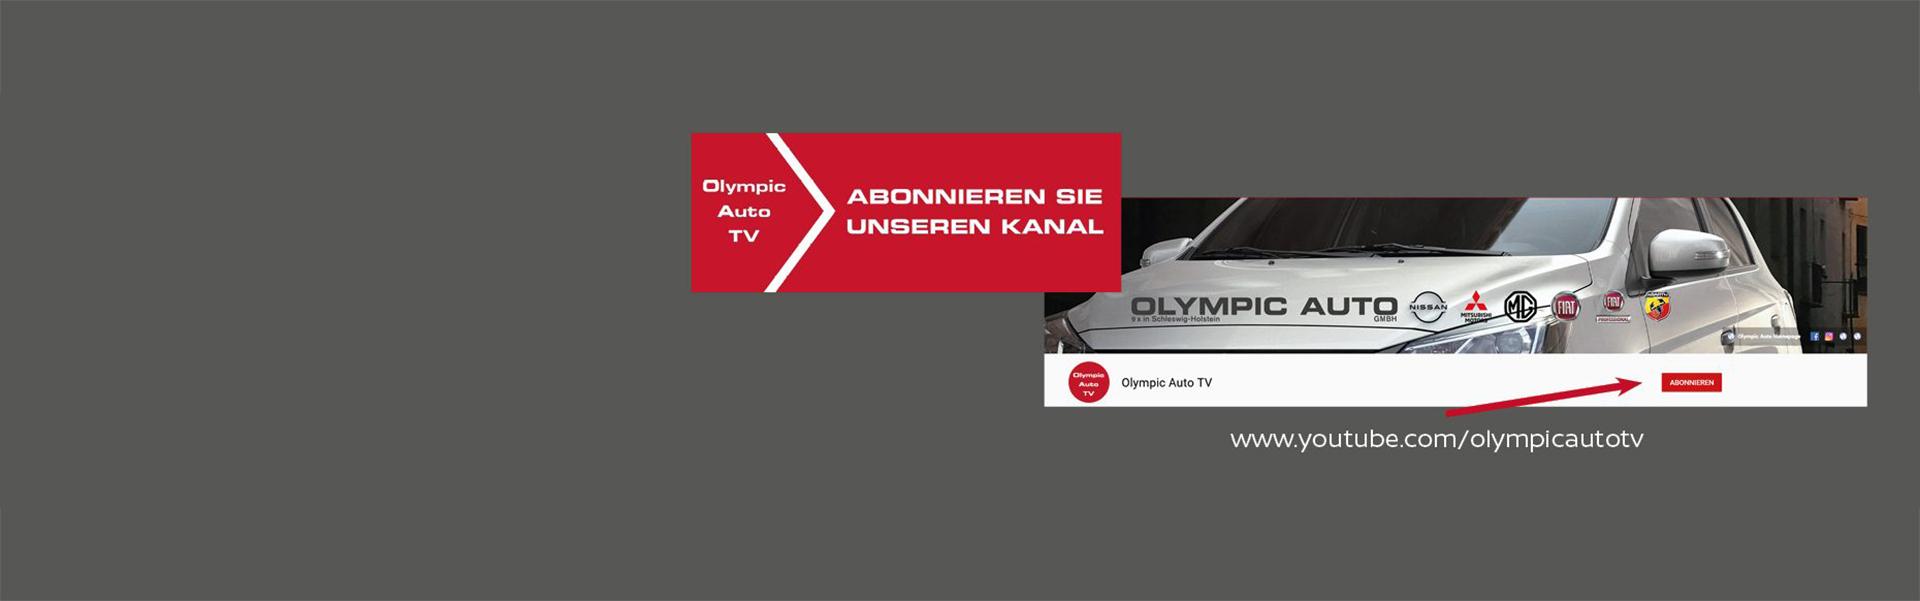 1920x600-olympic-tv-abonnieren-1860x400